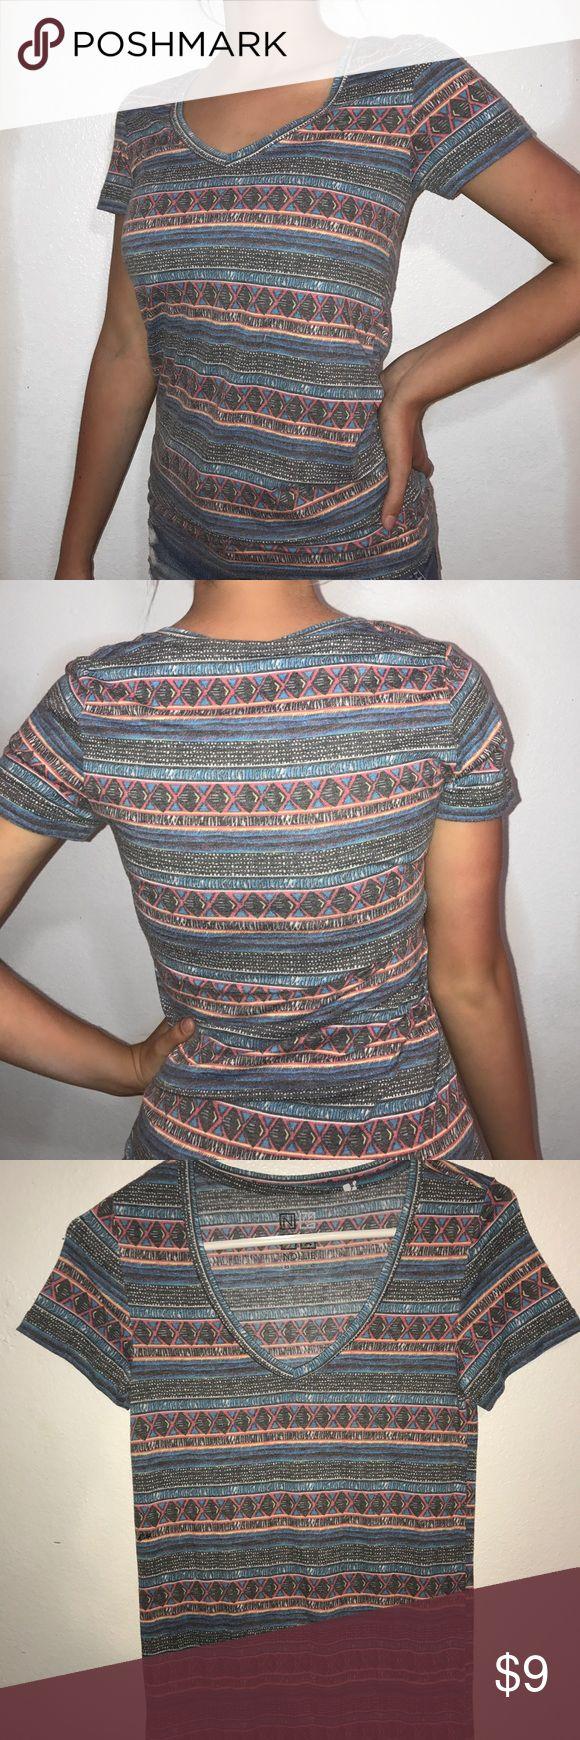 Colorful Aztec pattern top-pacsun Pacsun V-neck, Aztec pattern, short sleeve top. Nollie Tops Tees - Short Sleeve